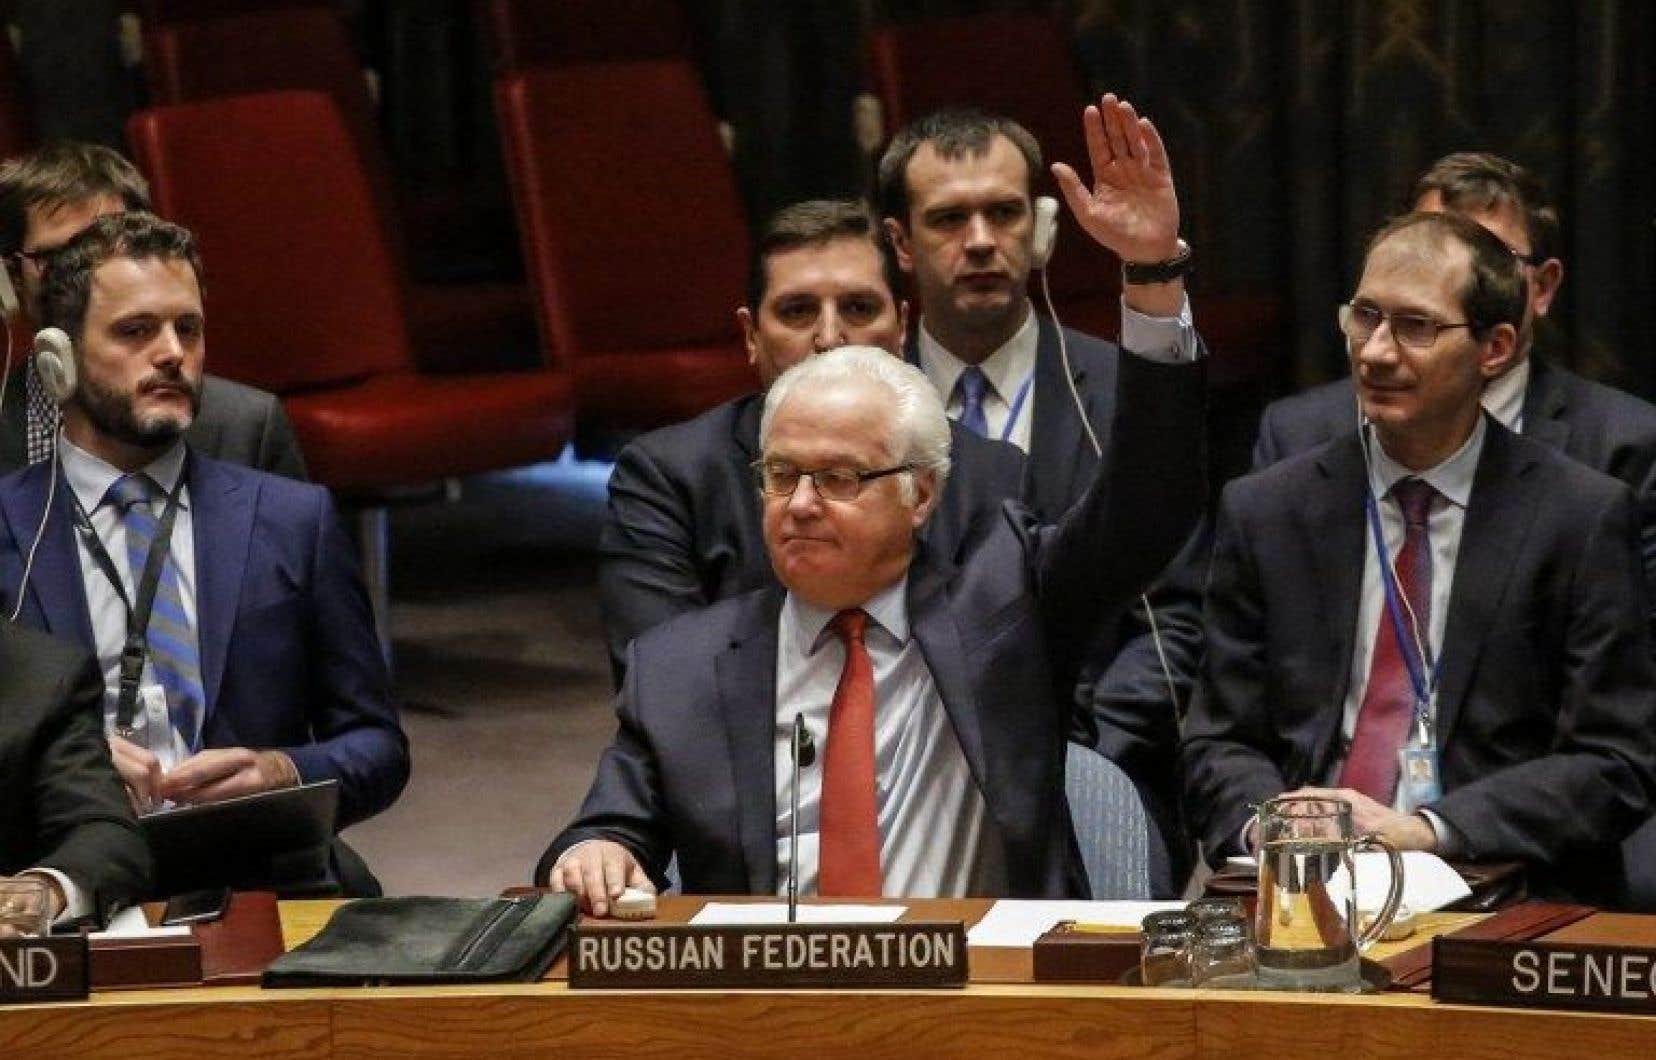 L'ambassadeur russe aux Nations unies, Vitaly Chourkine